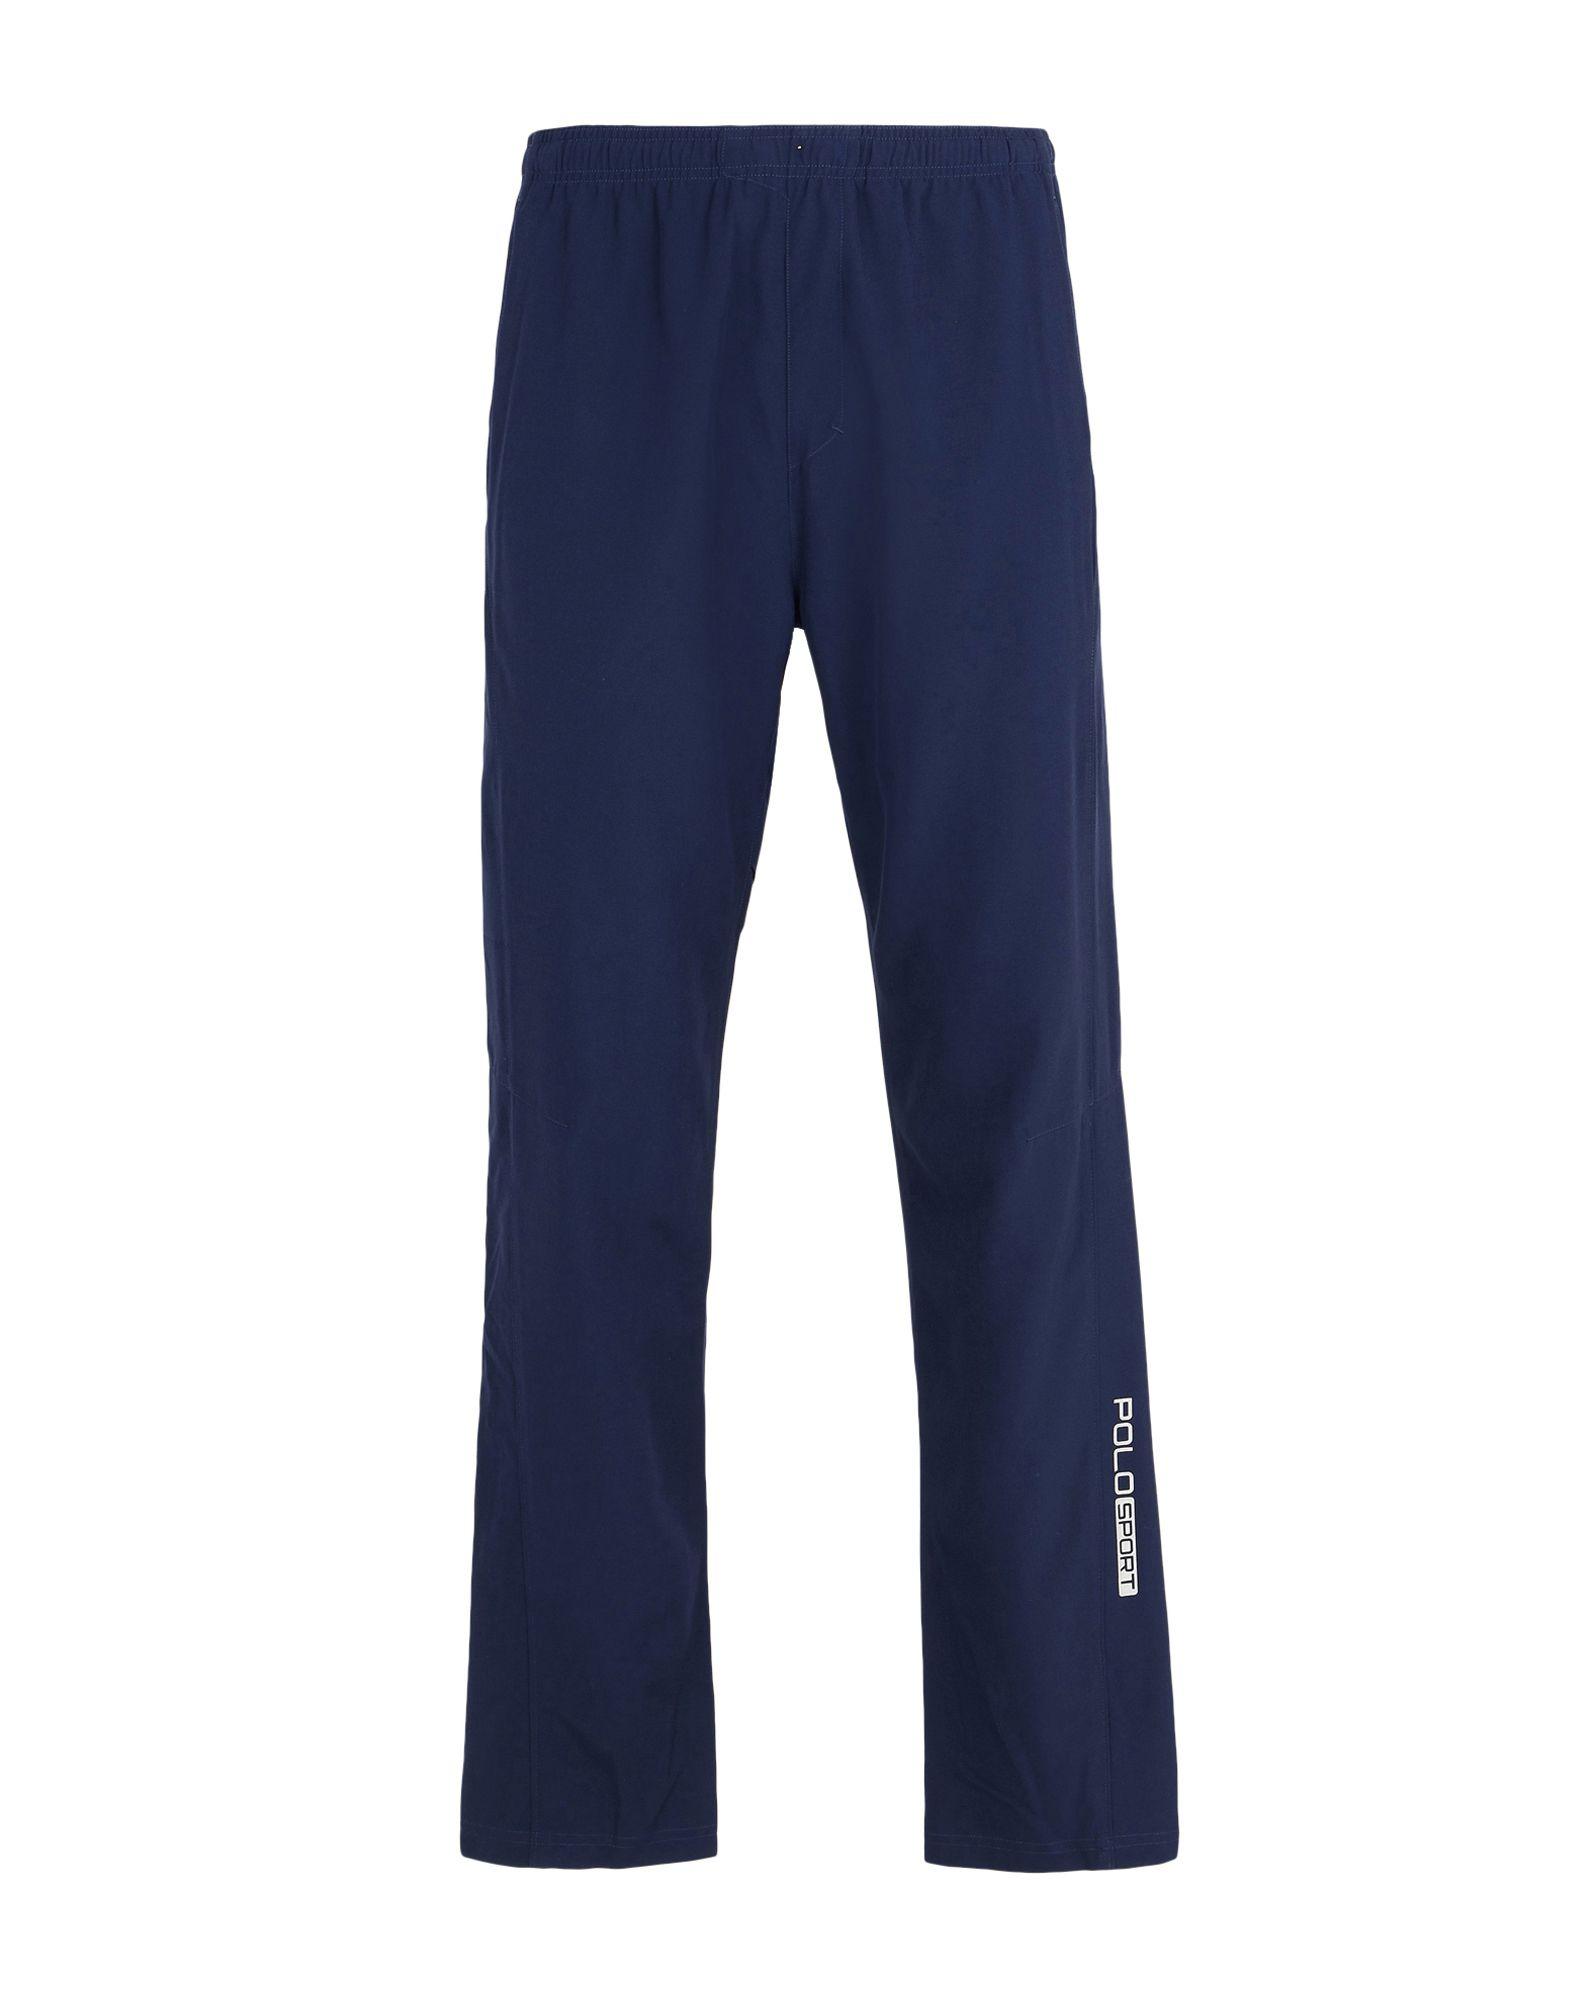 Pantalone Polo Uomo Sport Ralph Lauren Uomo Polo - 36969677RG 678c1d